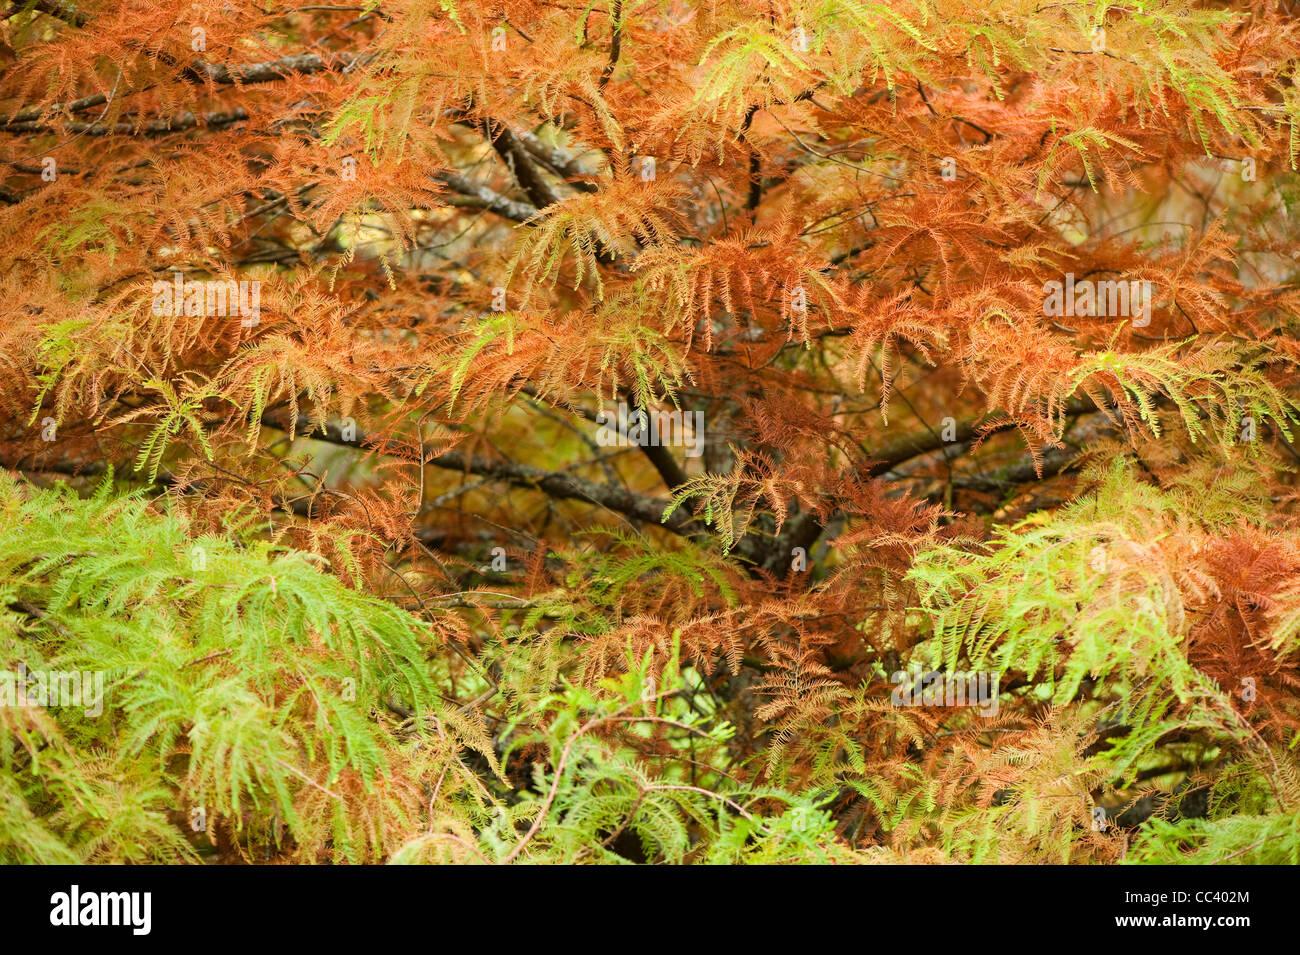 Cypress Gardens Stock Photos & Cypress Gardens Stock Images - Alamy